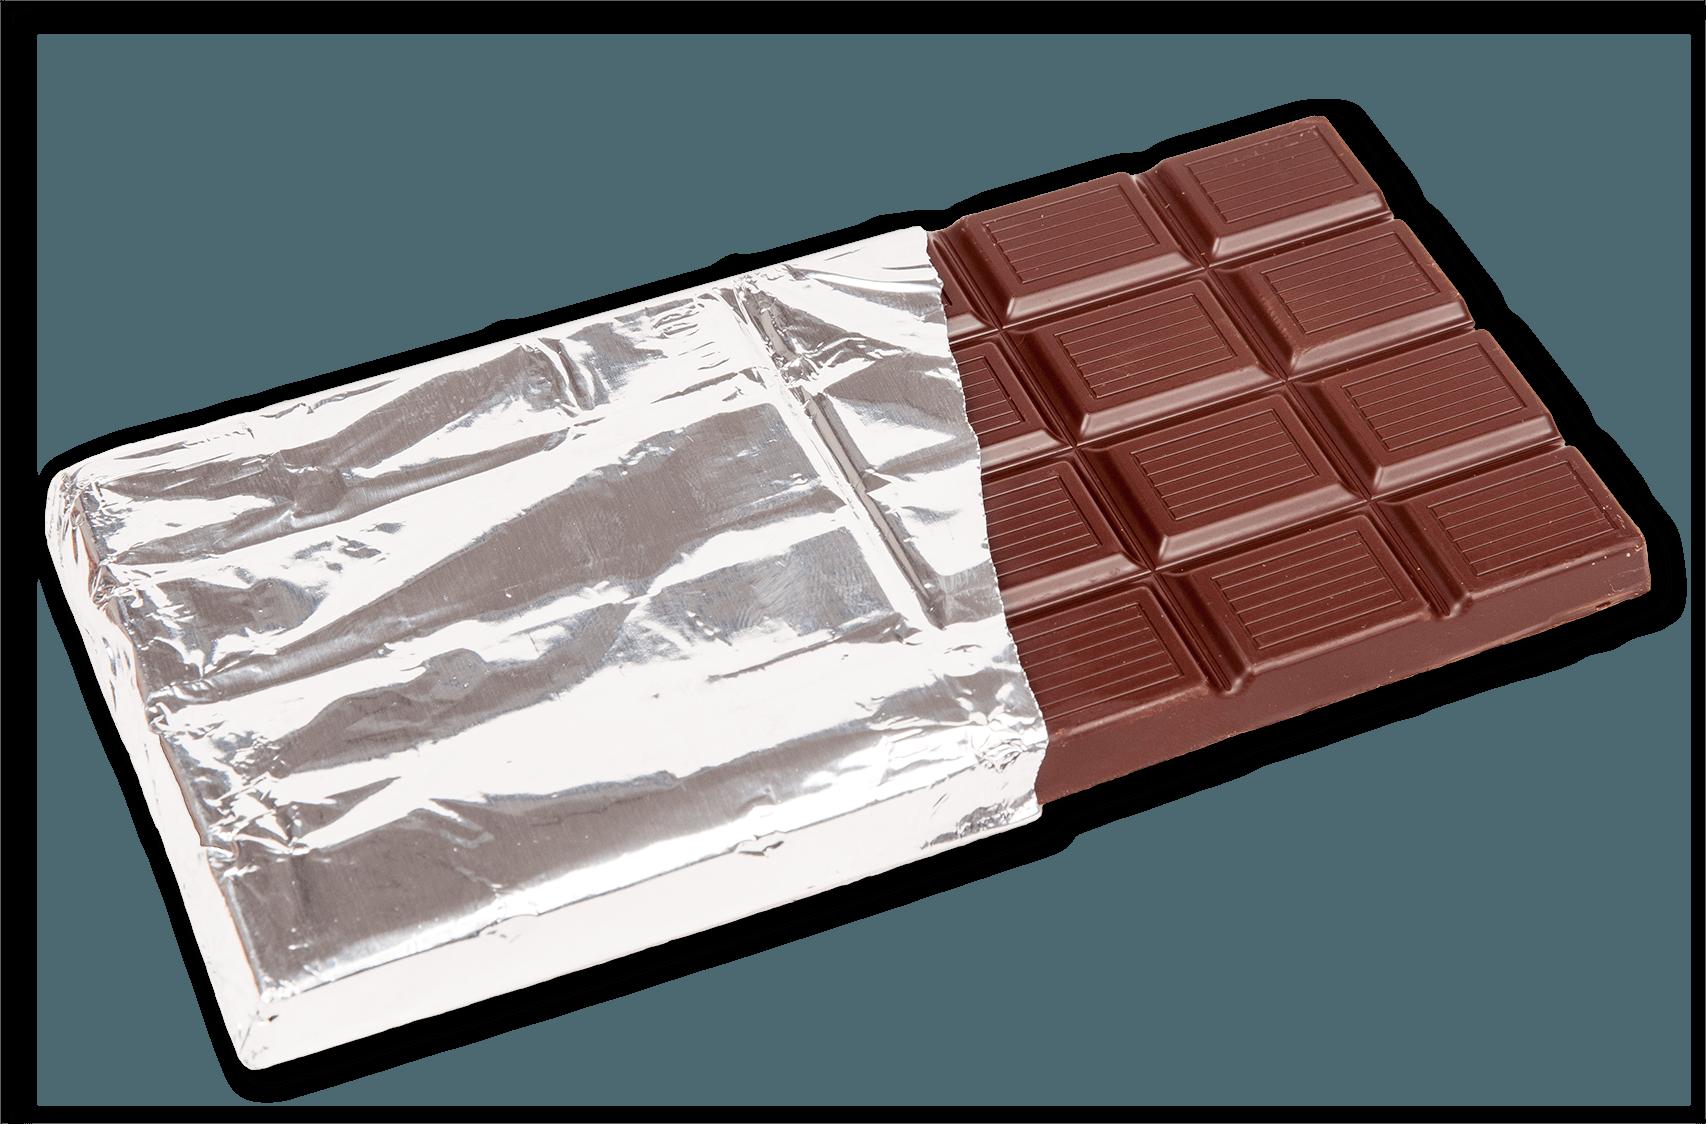 10 x 100g Schokolade in Dose verpackt | SicherSatt